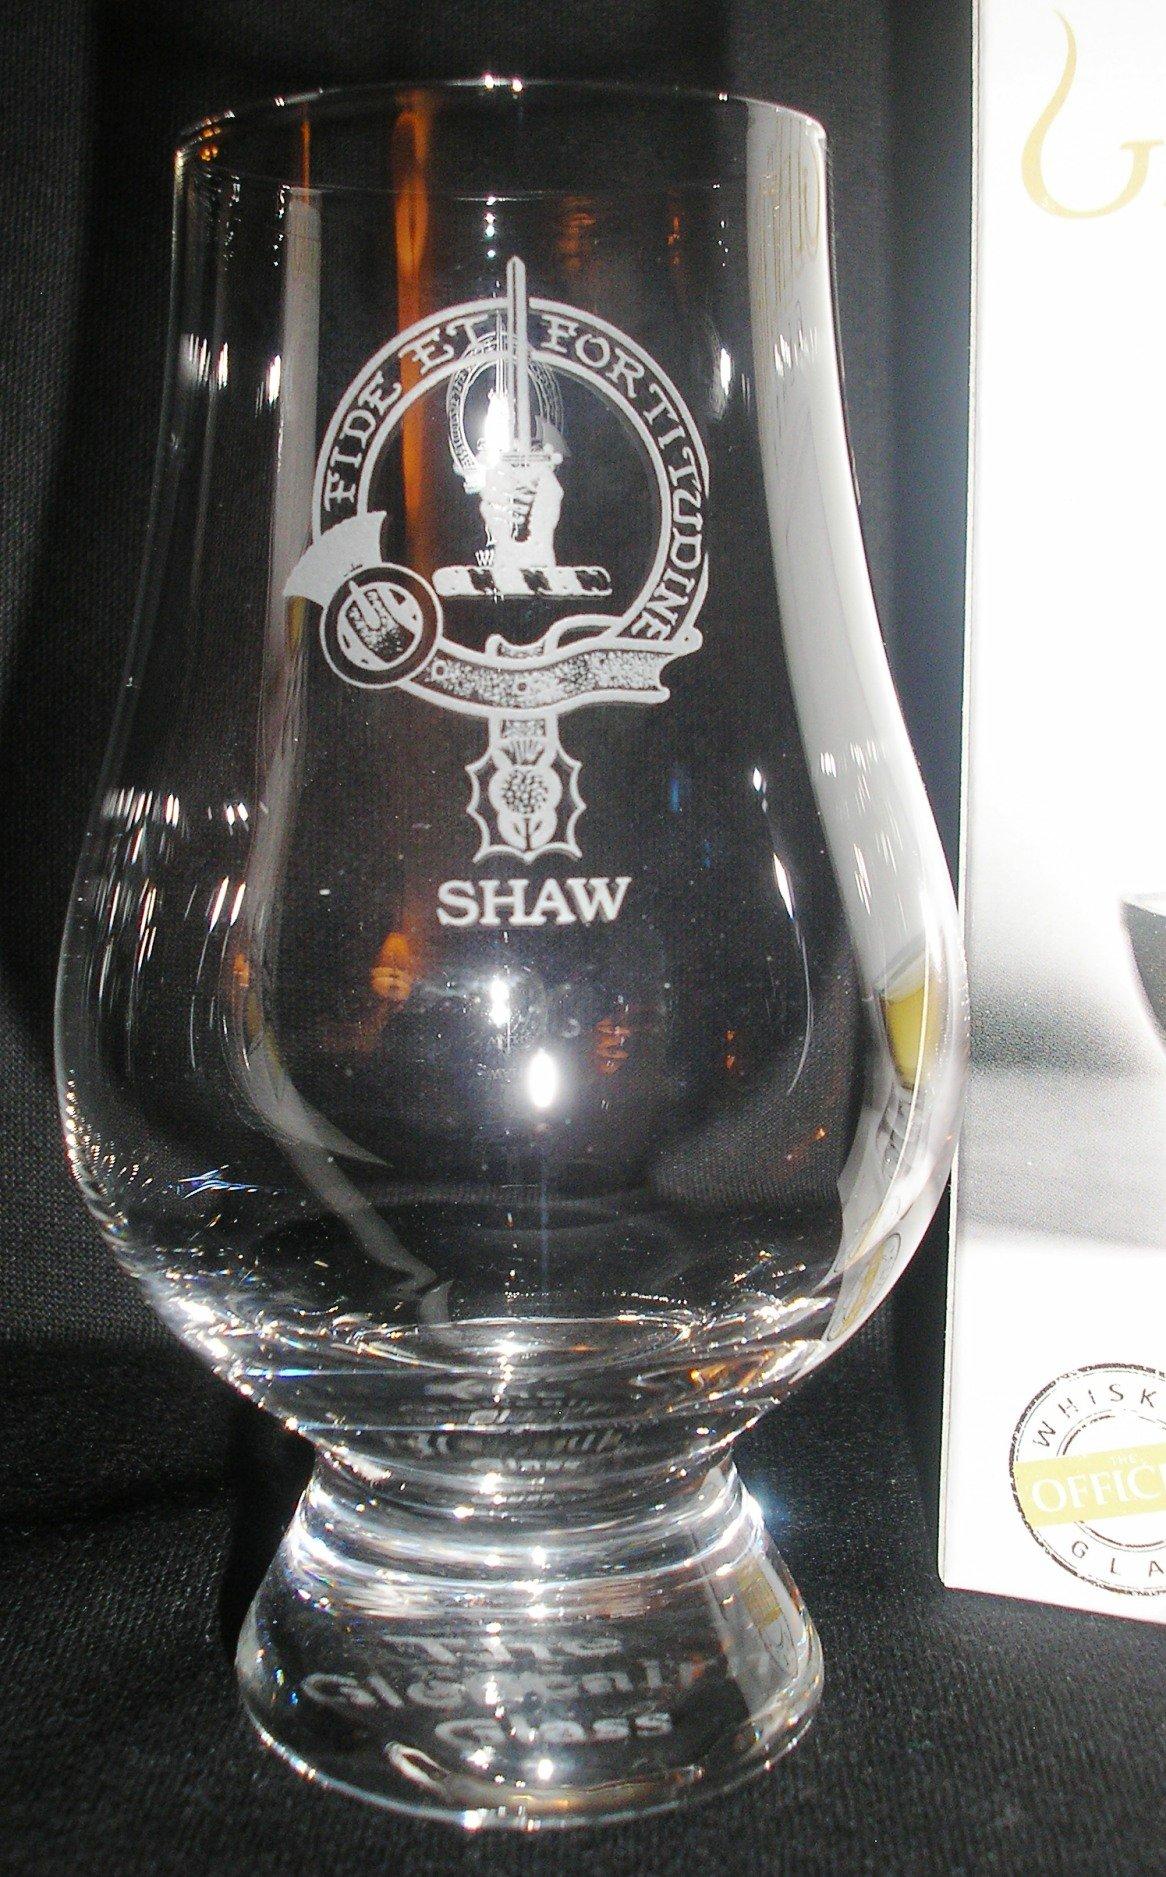 CLAN SHAW GLENCAIRN SINGLE MALT SCOTCH WHISKY TASTING GLASS